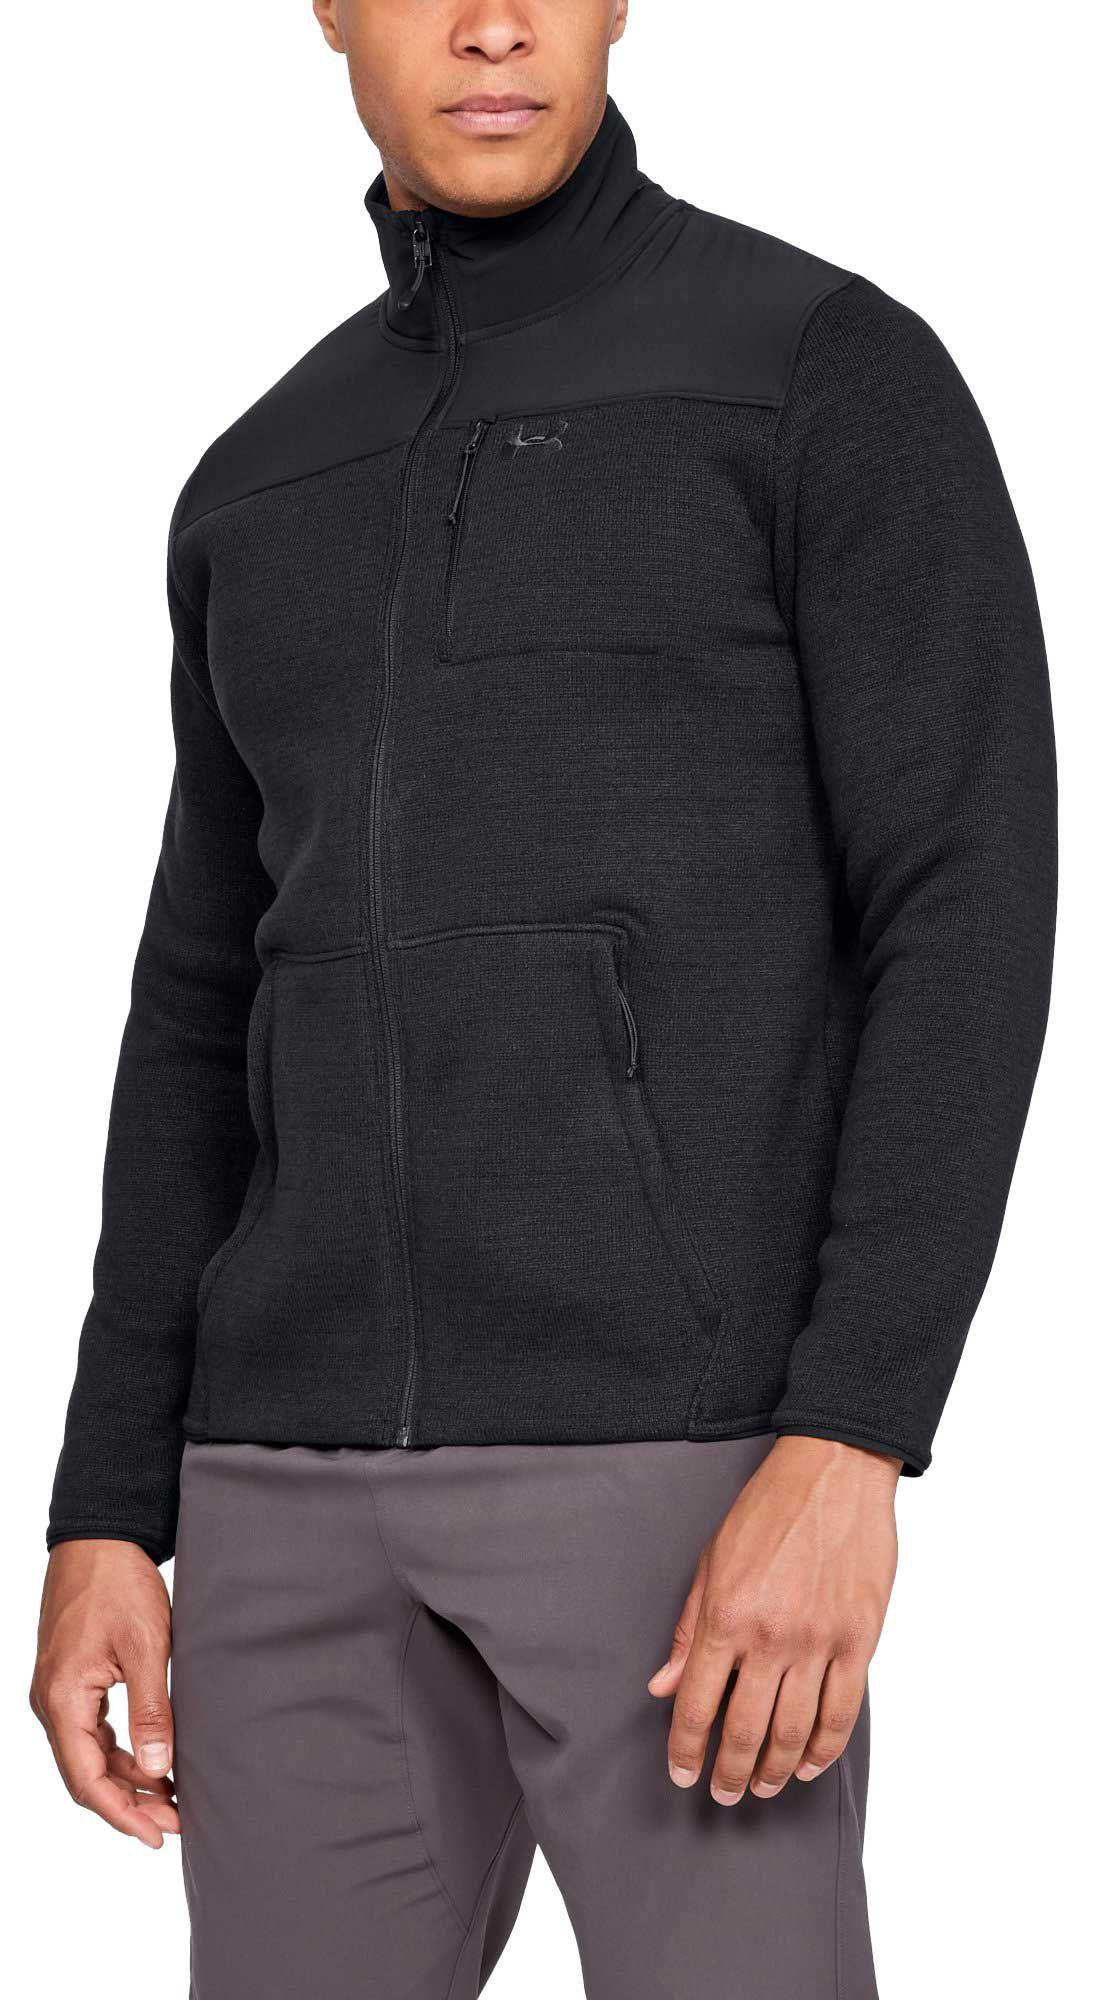 ccdf3dc429b0e3 Under Armour Men s Specialist 2.0 Fleece Jacket